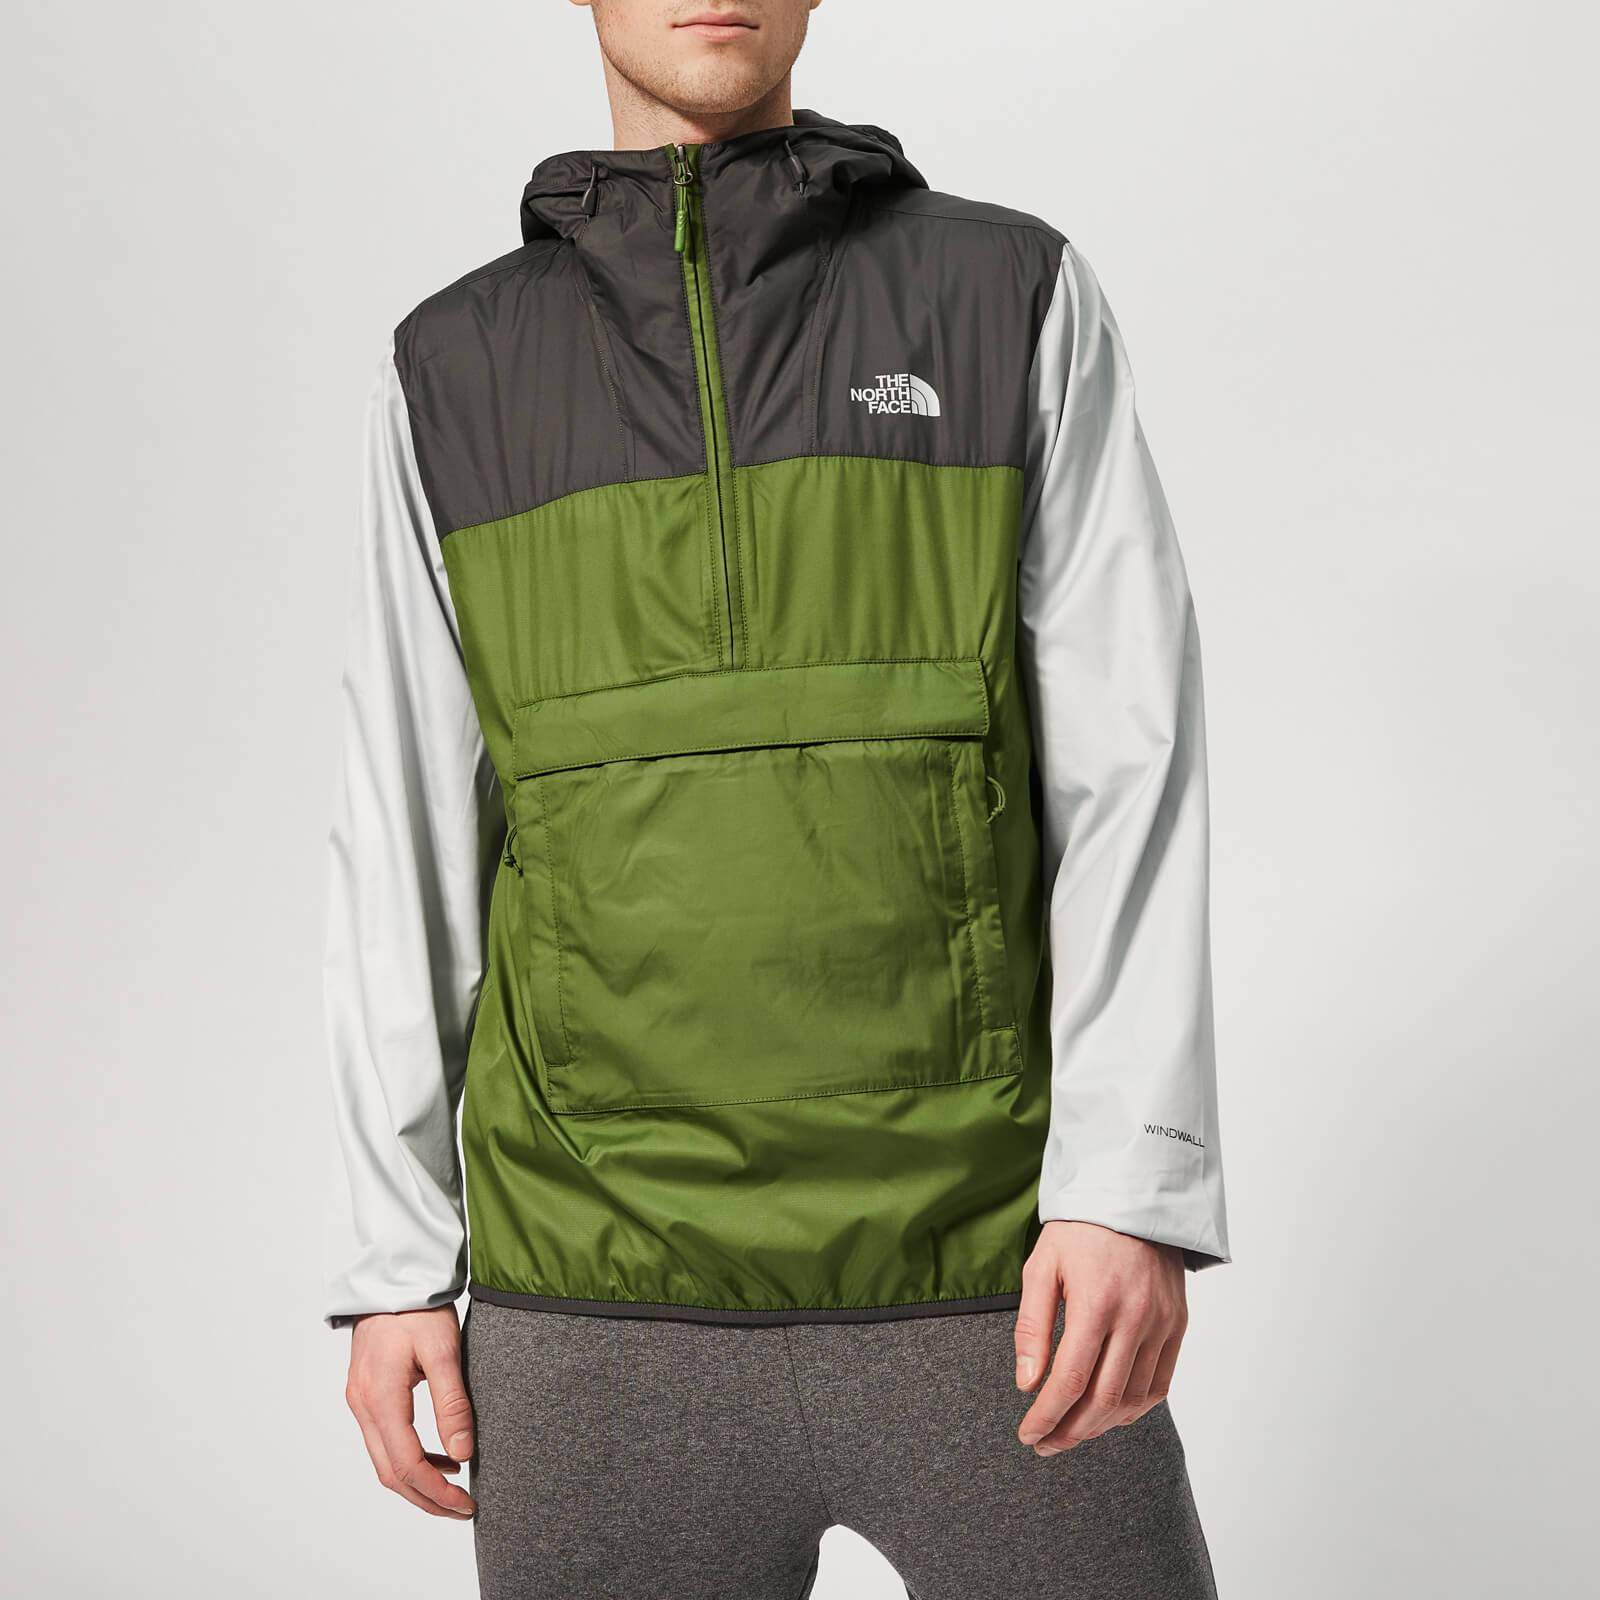 The North Face Men's Fanorak Jacket - Garden Green/Asphalt Grey - L